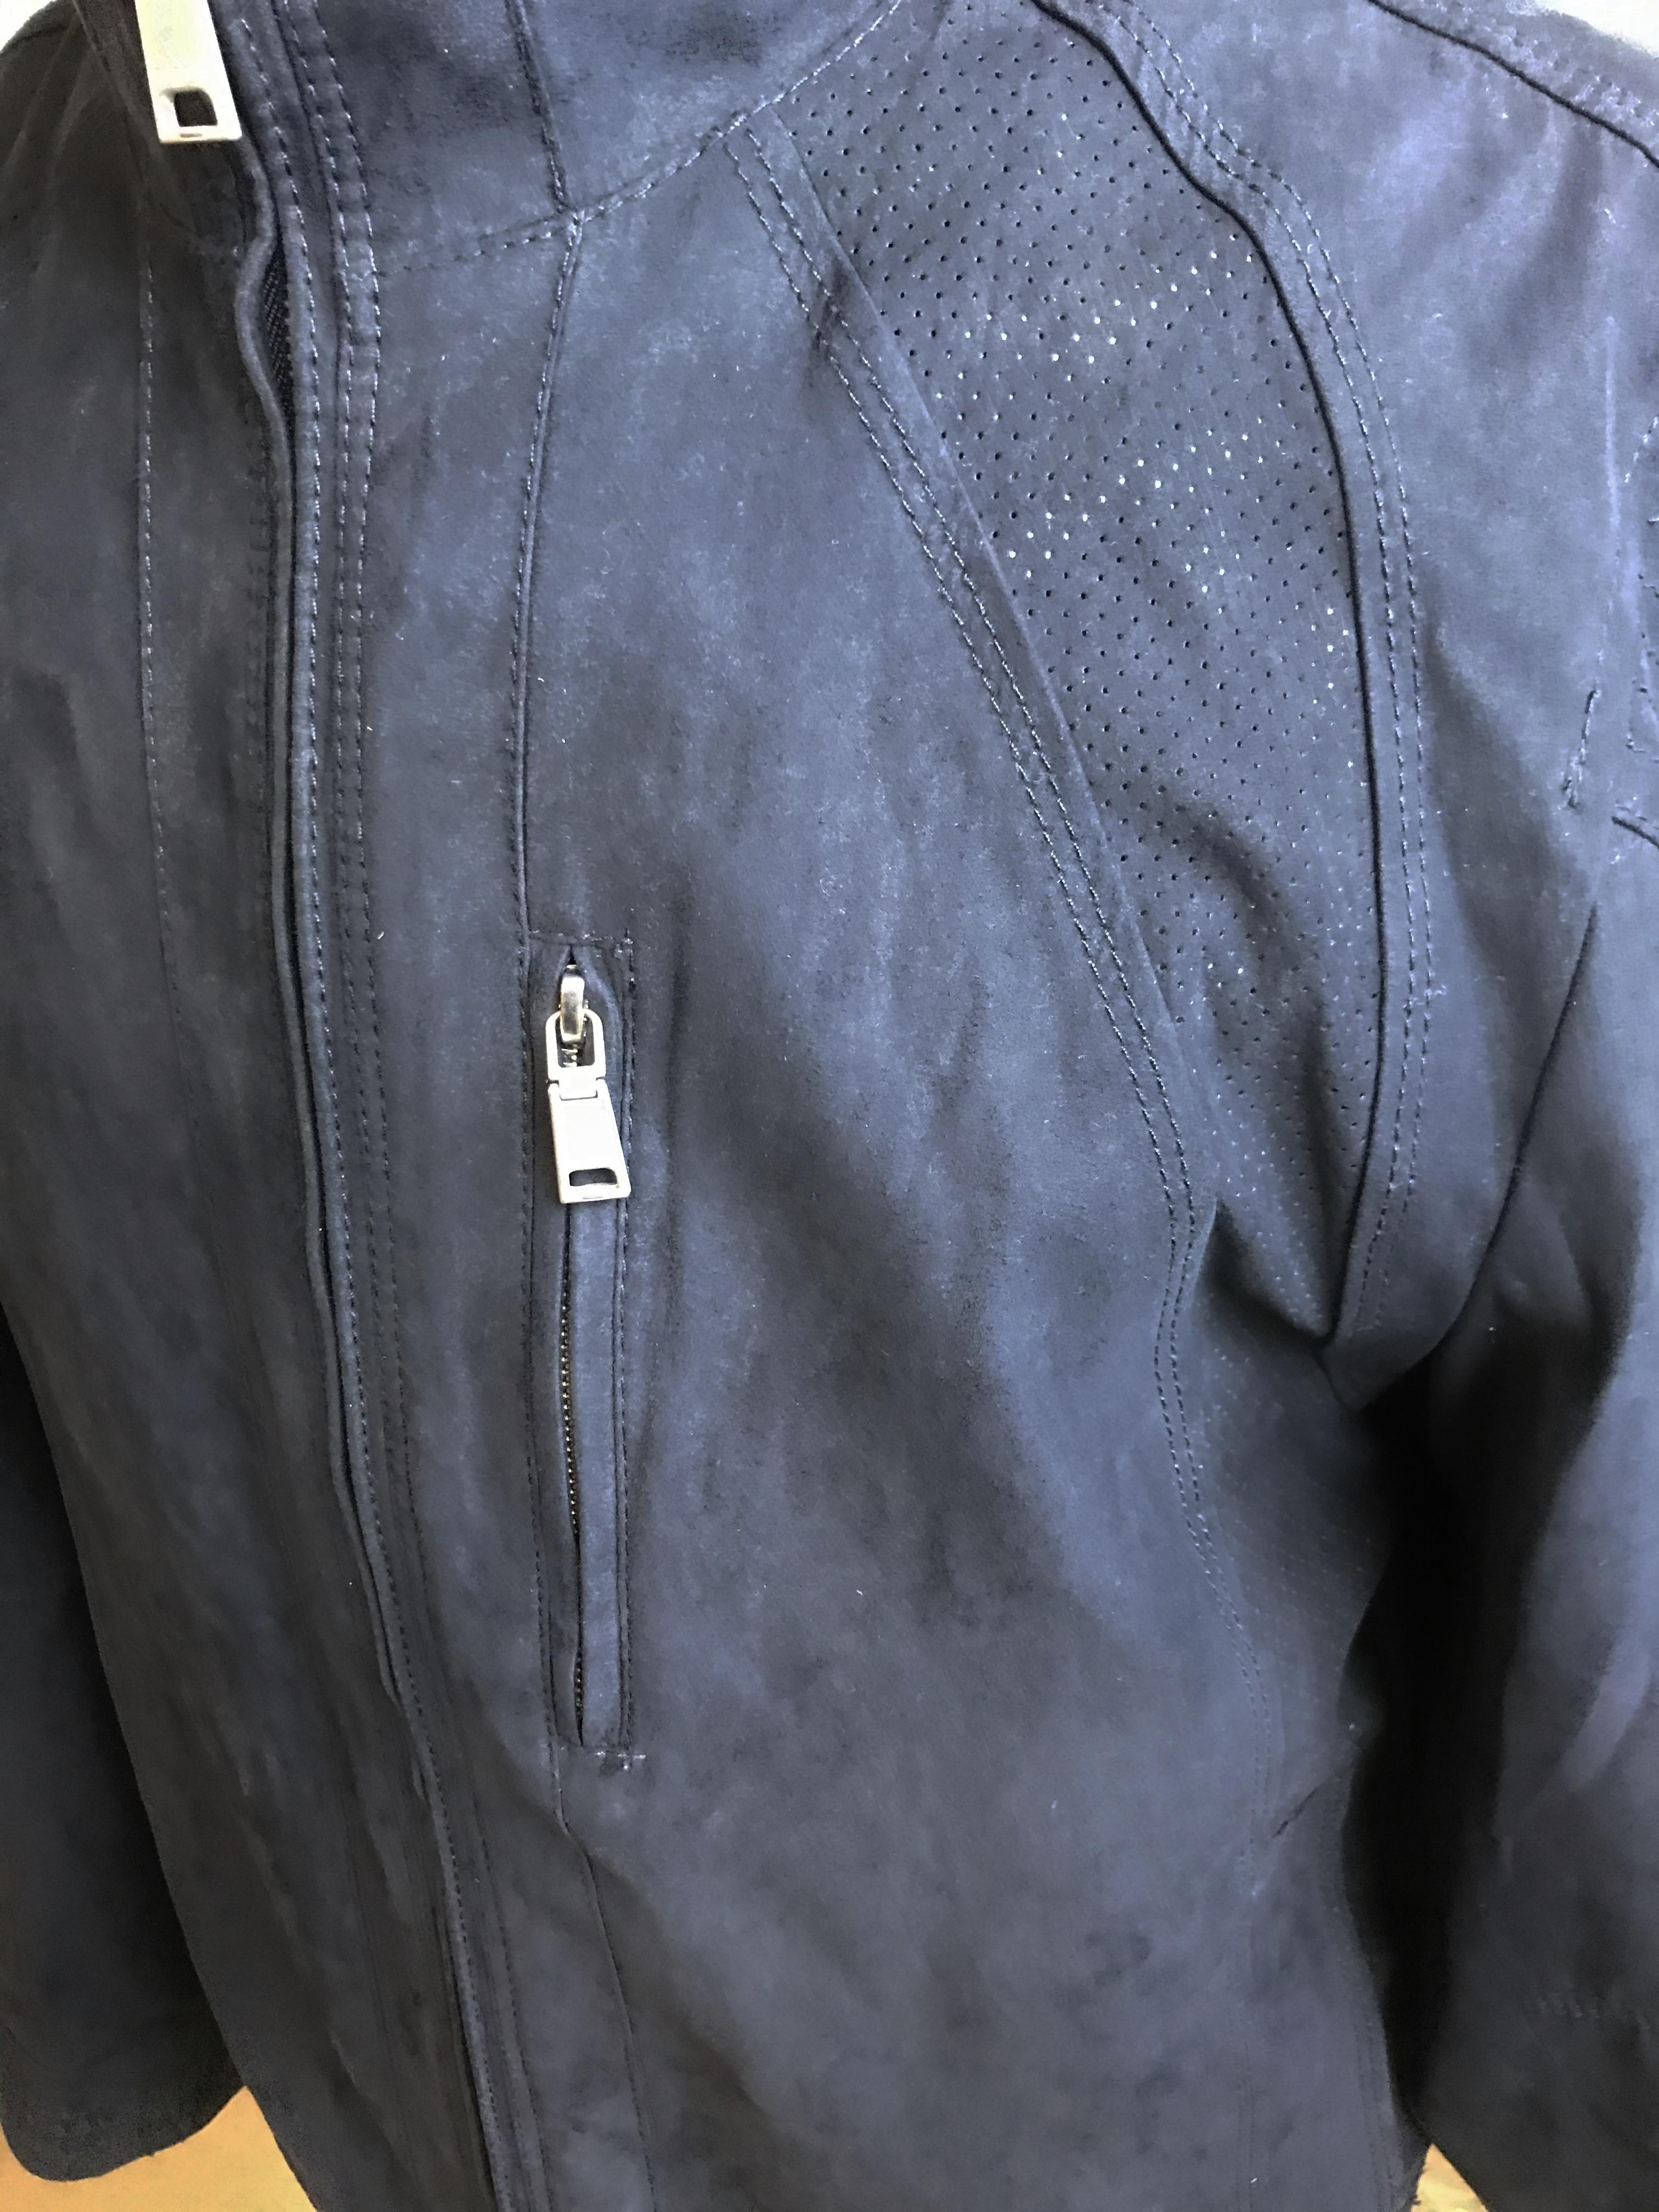 Lot 10 - Bugatti Official Merchandise Navy Jacket